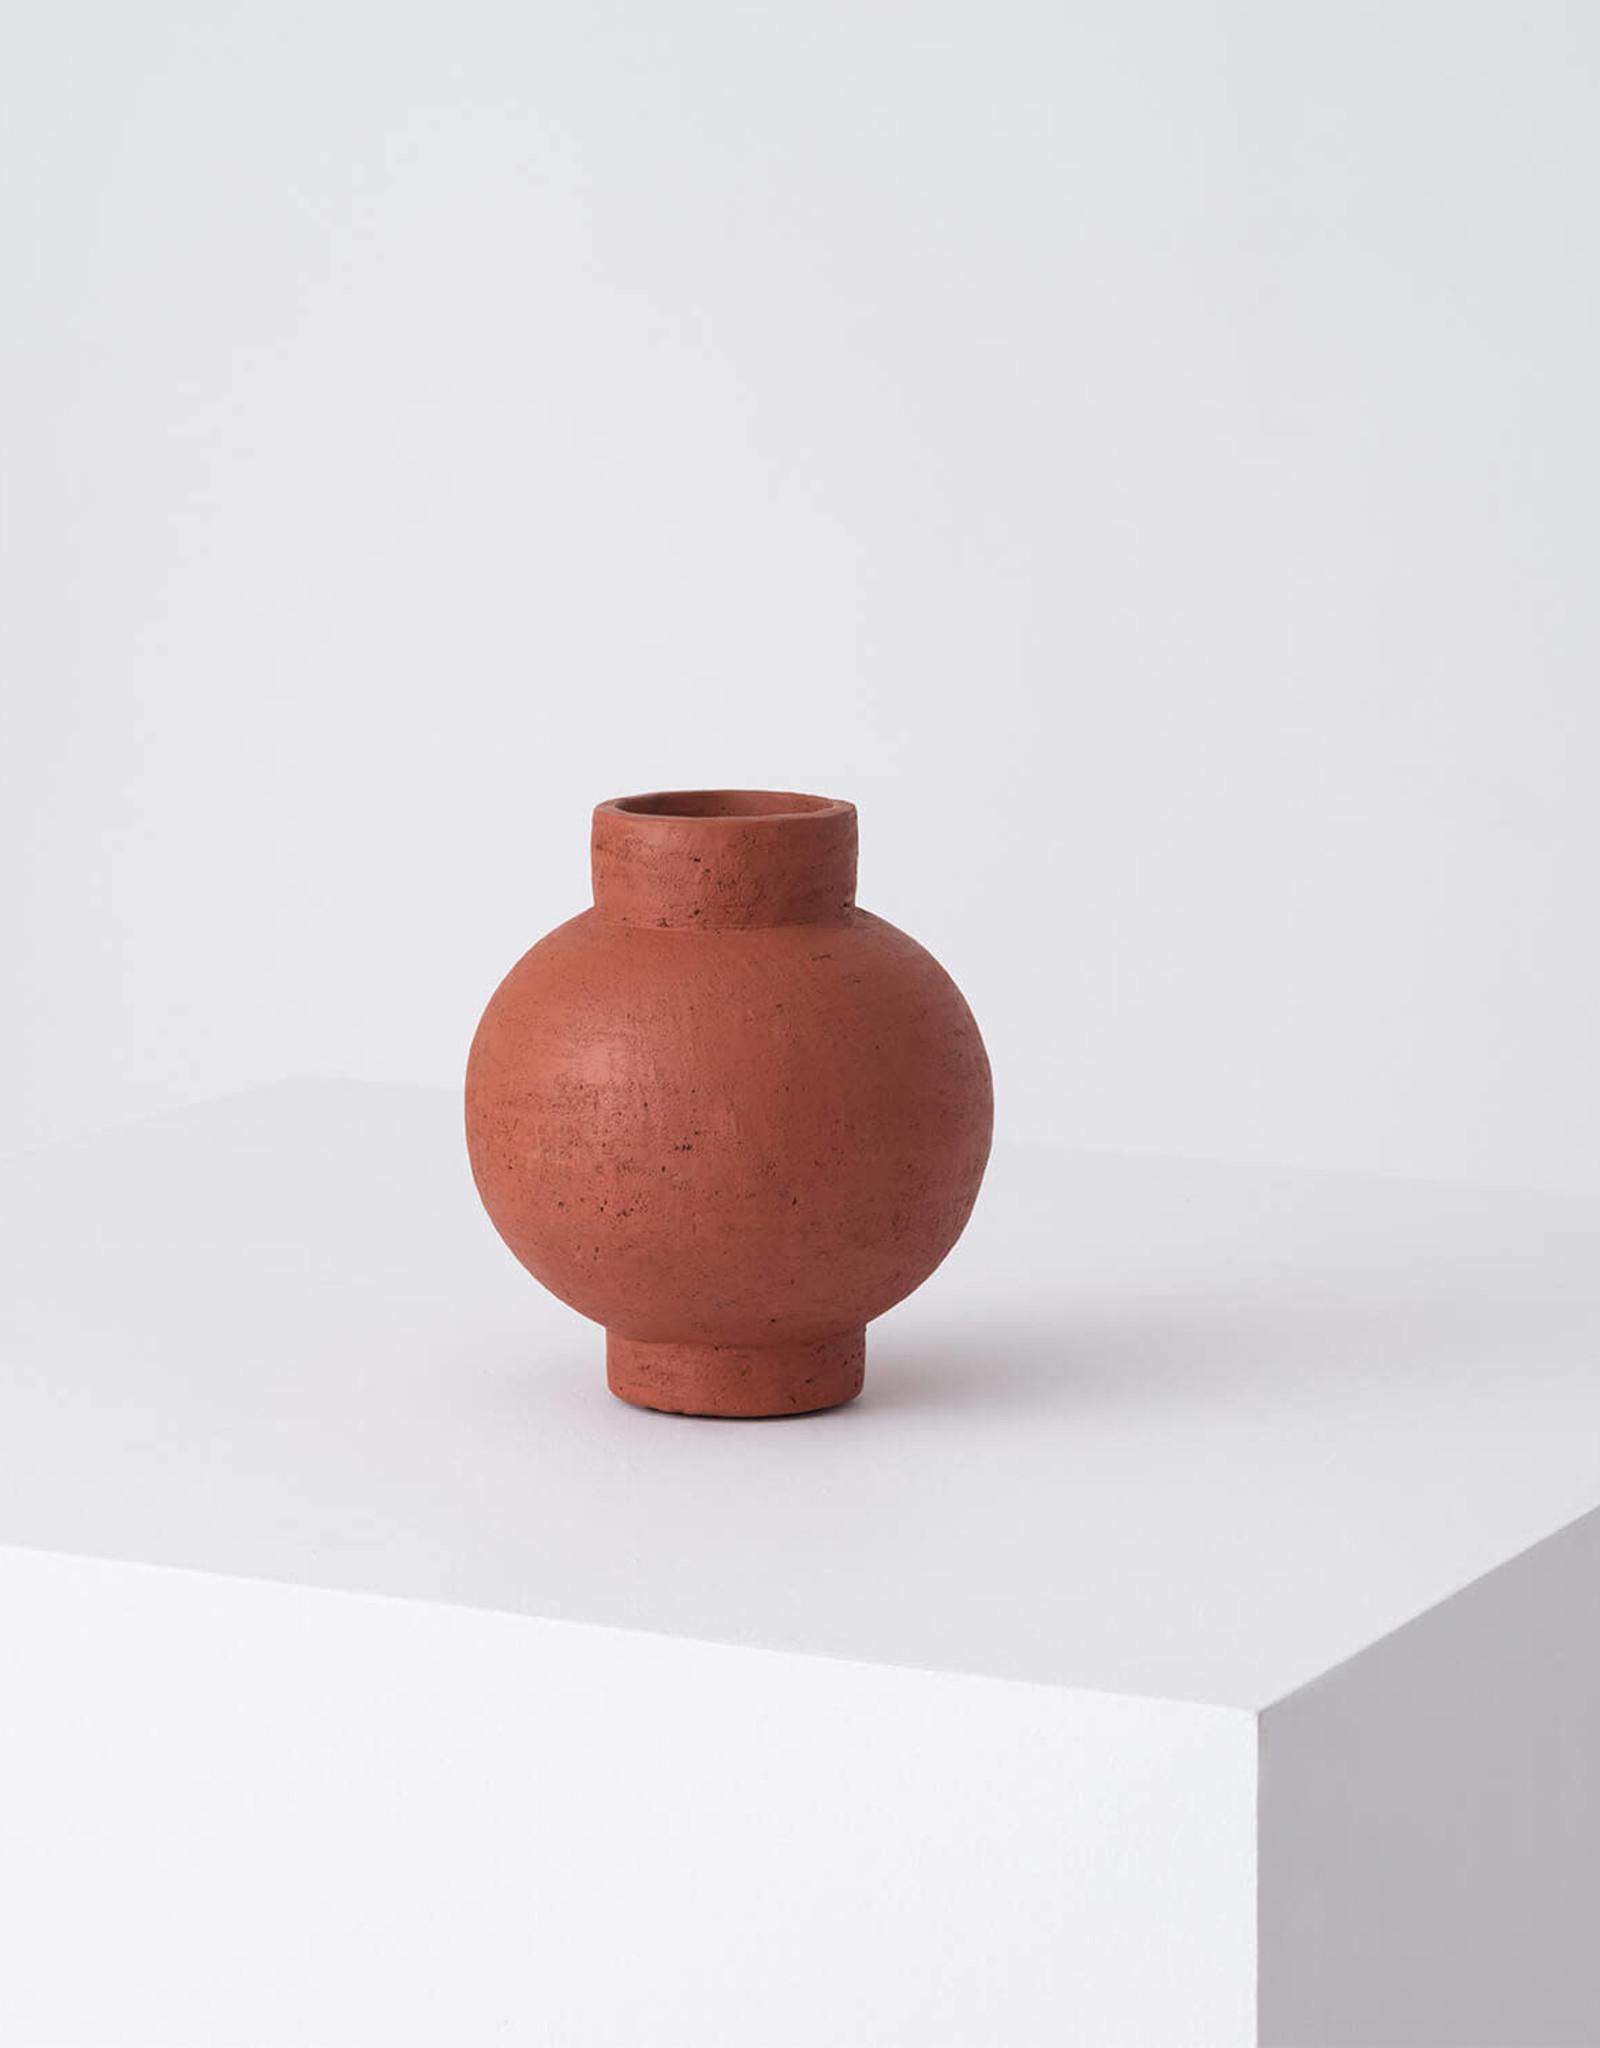 EQ3 Terracotta -Round Vase